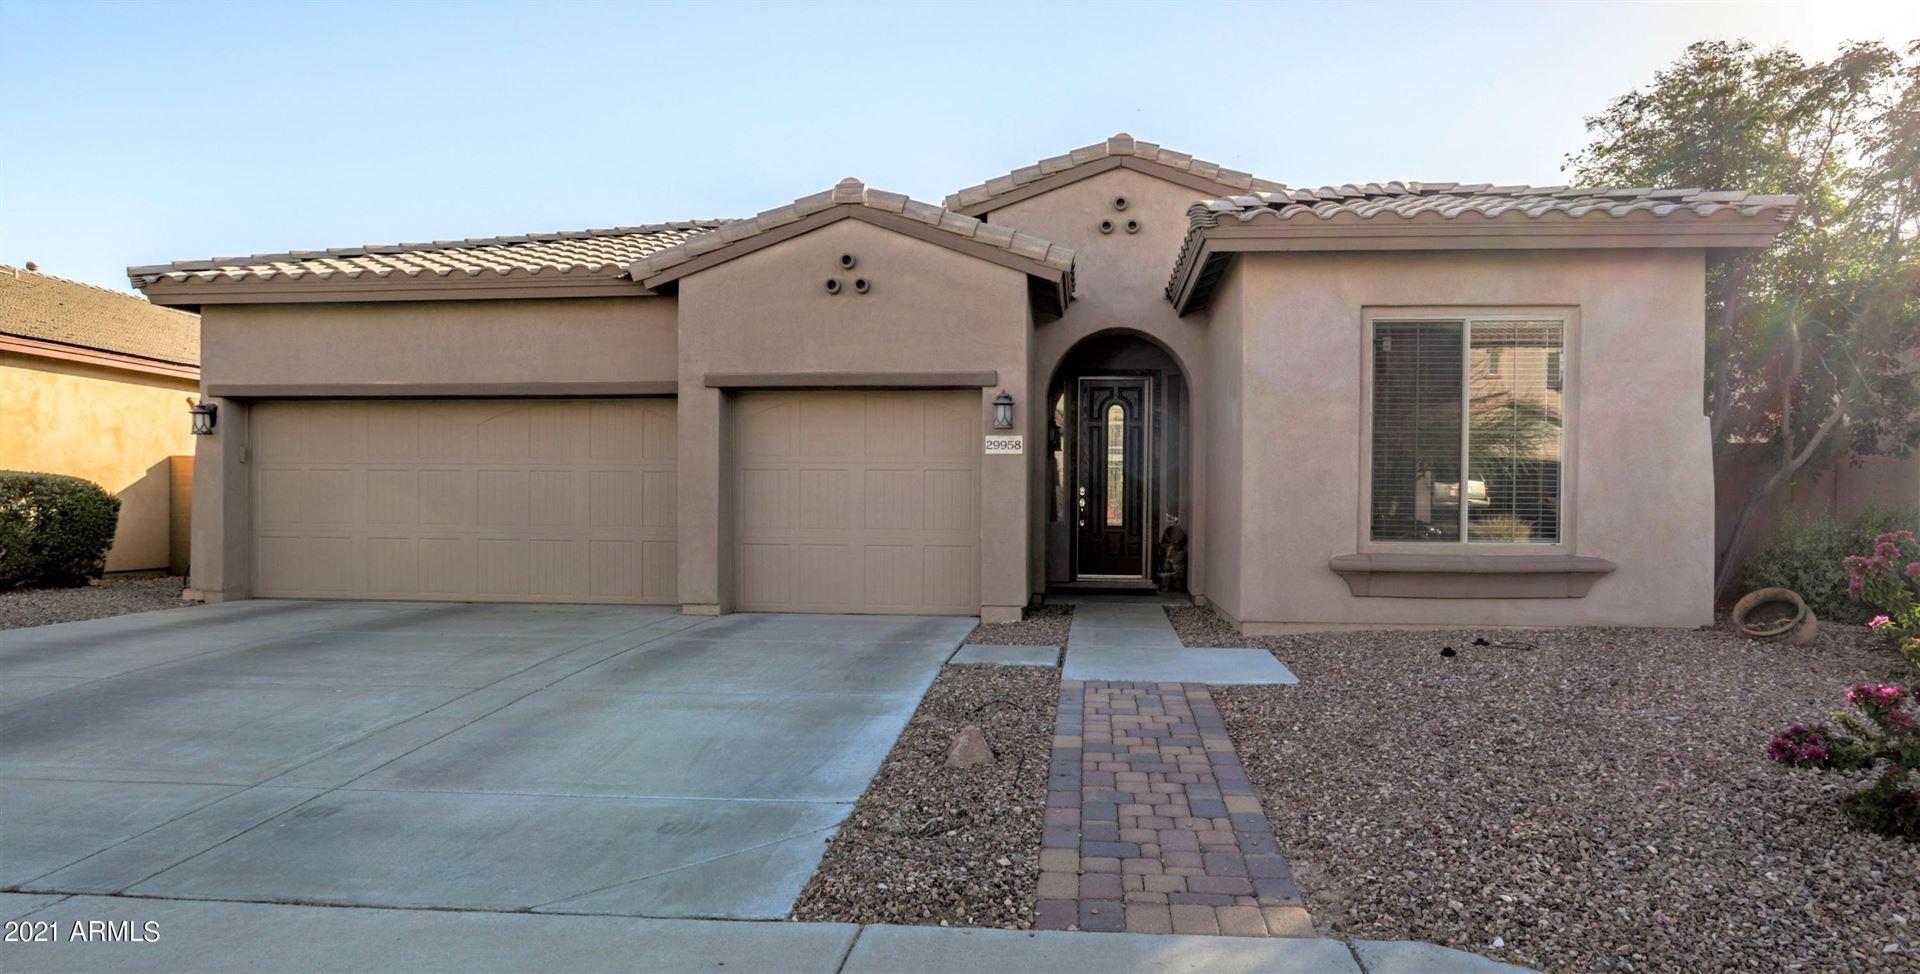 Photo of 29958 N 128TH Avenue, Peoria, AZ 85383 (MLS # 6228823)